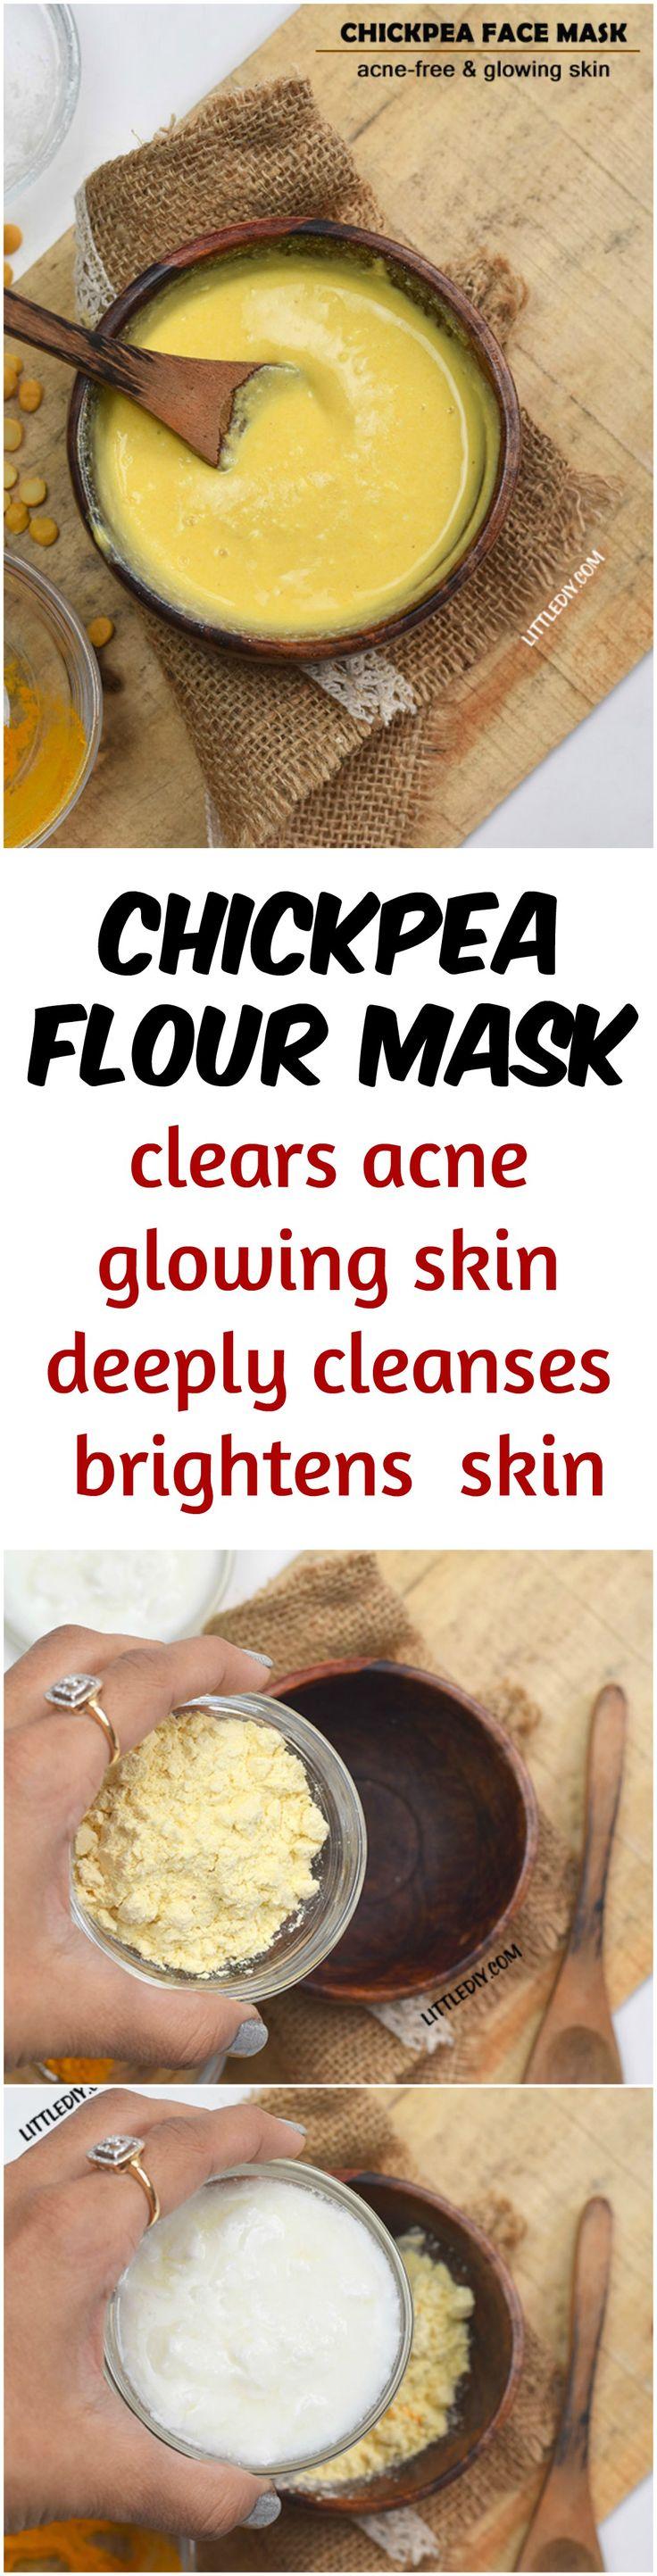 best 25+ glowing skin products ideas on pinterest | beauty tips